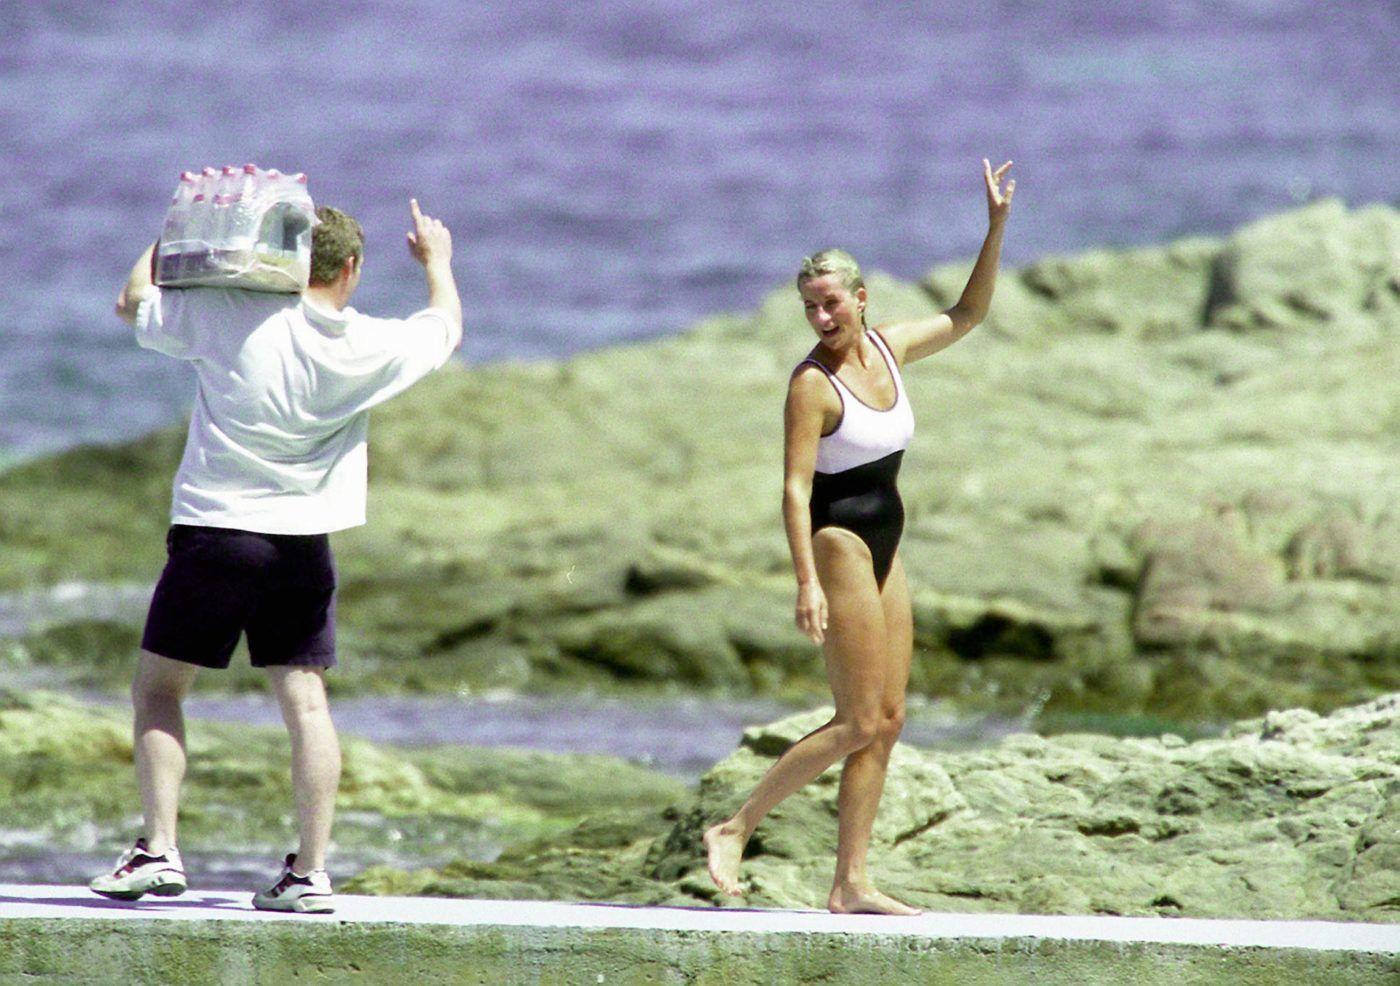 Diana hercegnő 1997-ben a strandon